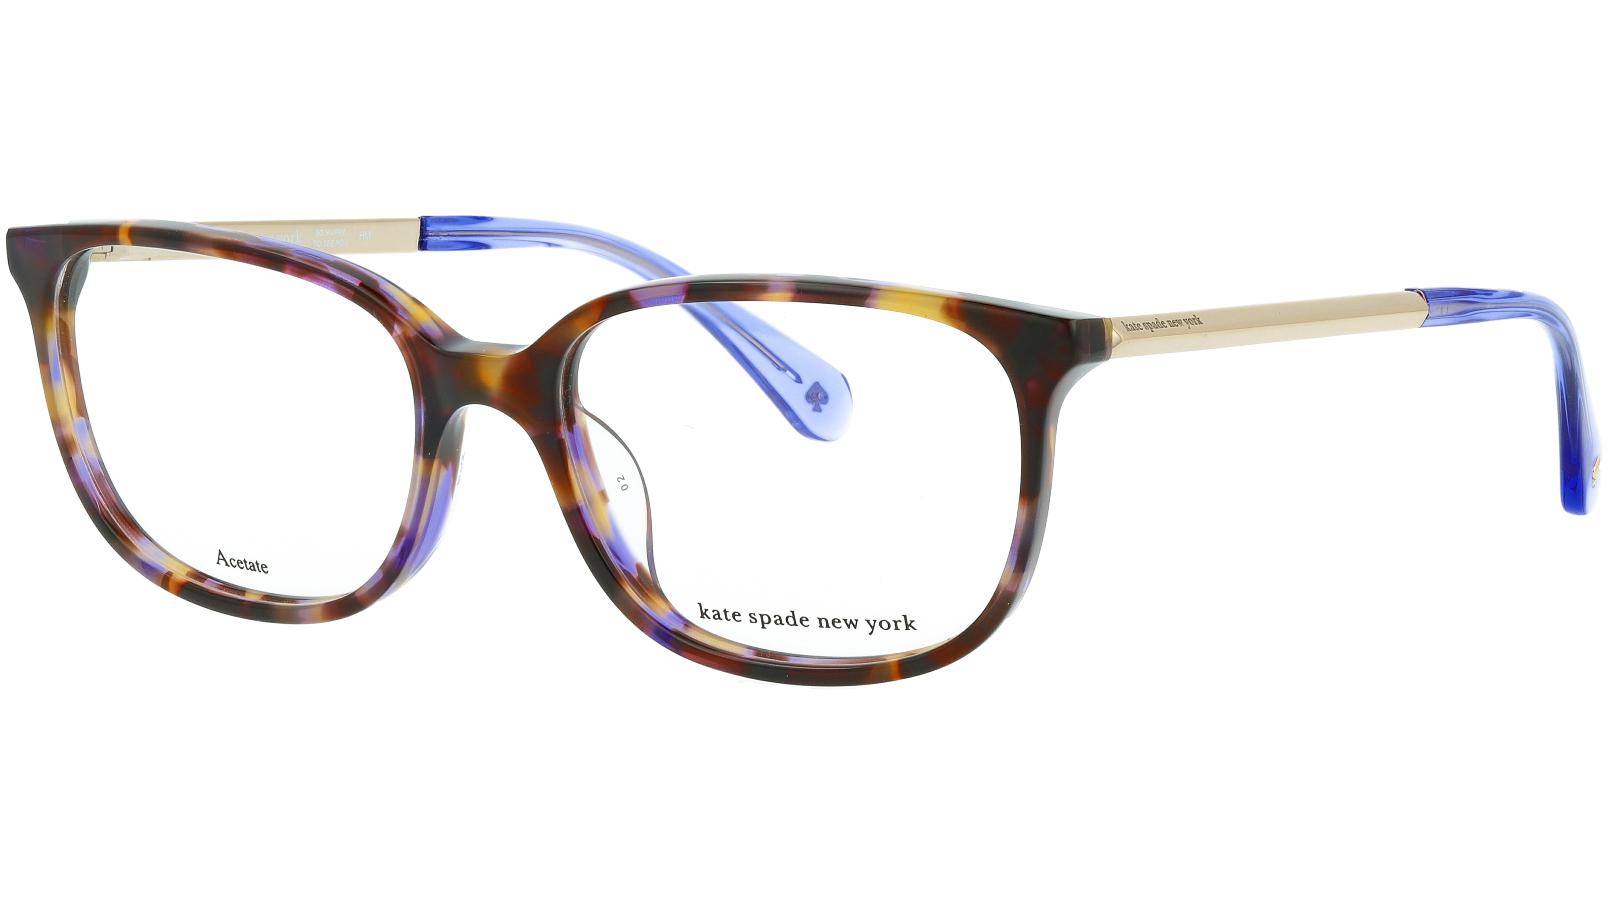 KATE SPADE NATALIA XP8 50 BLUE Glasses